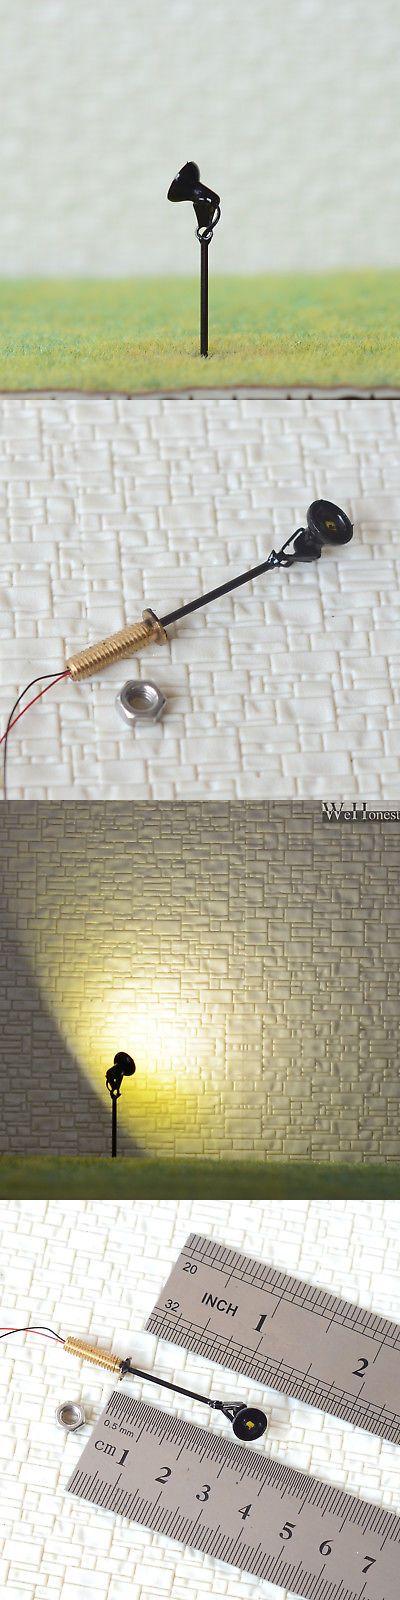 10 X Oo Ho Street Spotlight Led Limelight Model Projector Lamp Resistor 4bl Projector Lamp Projector Lights